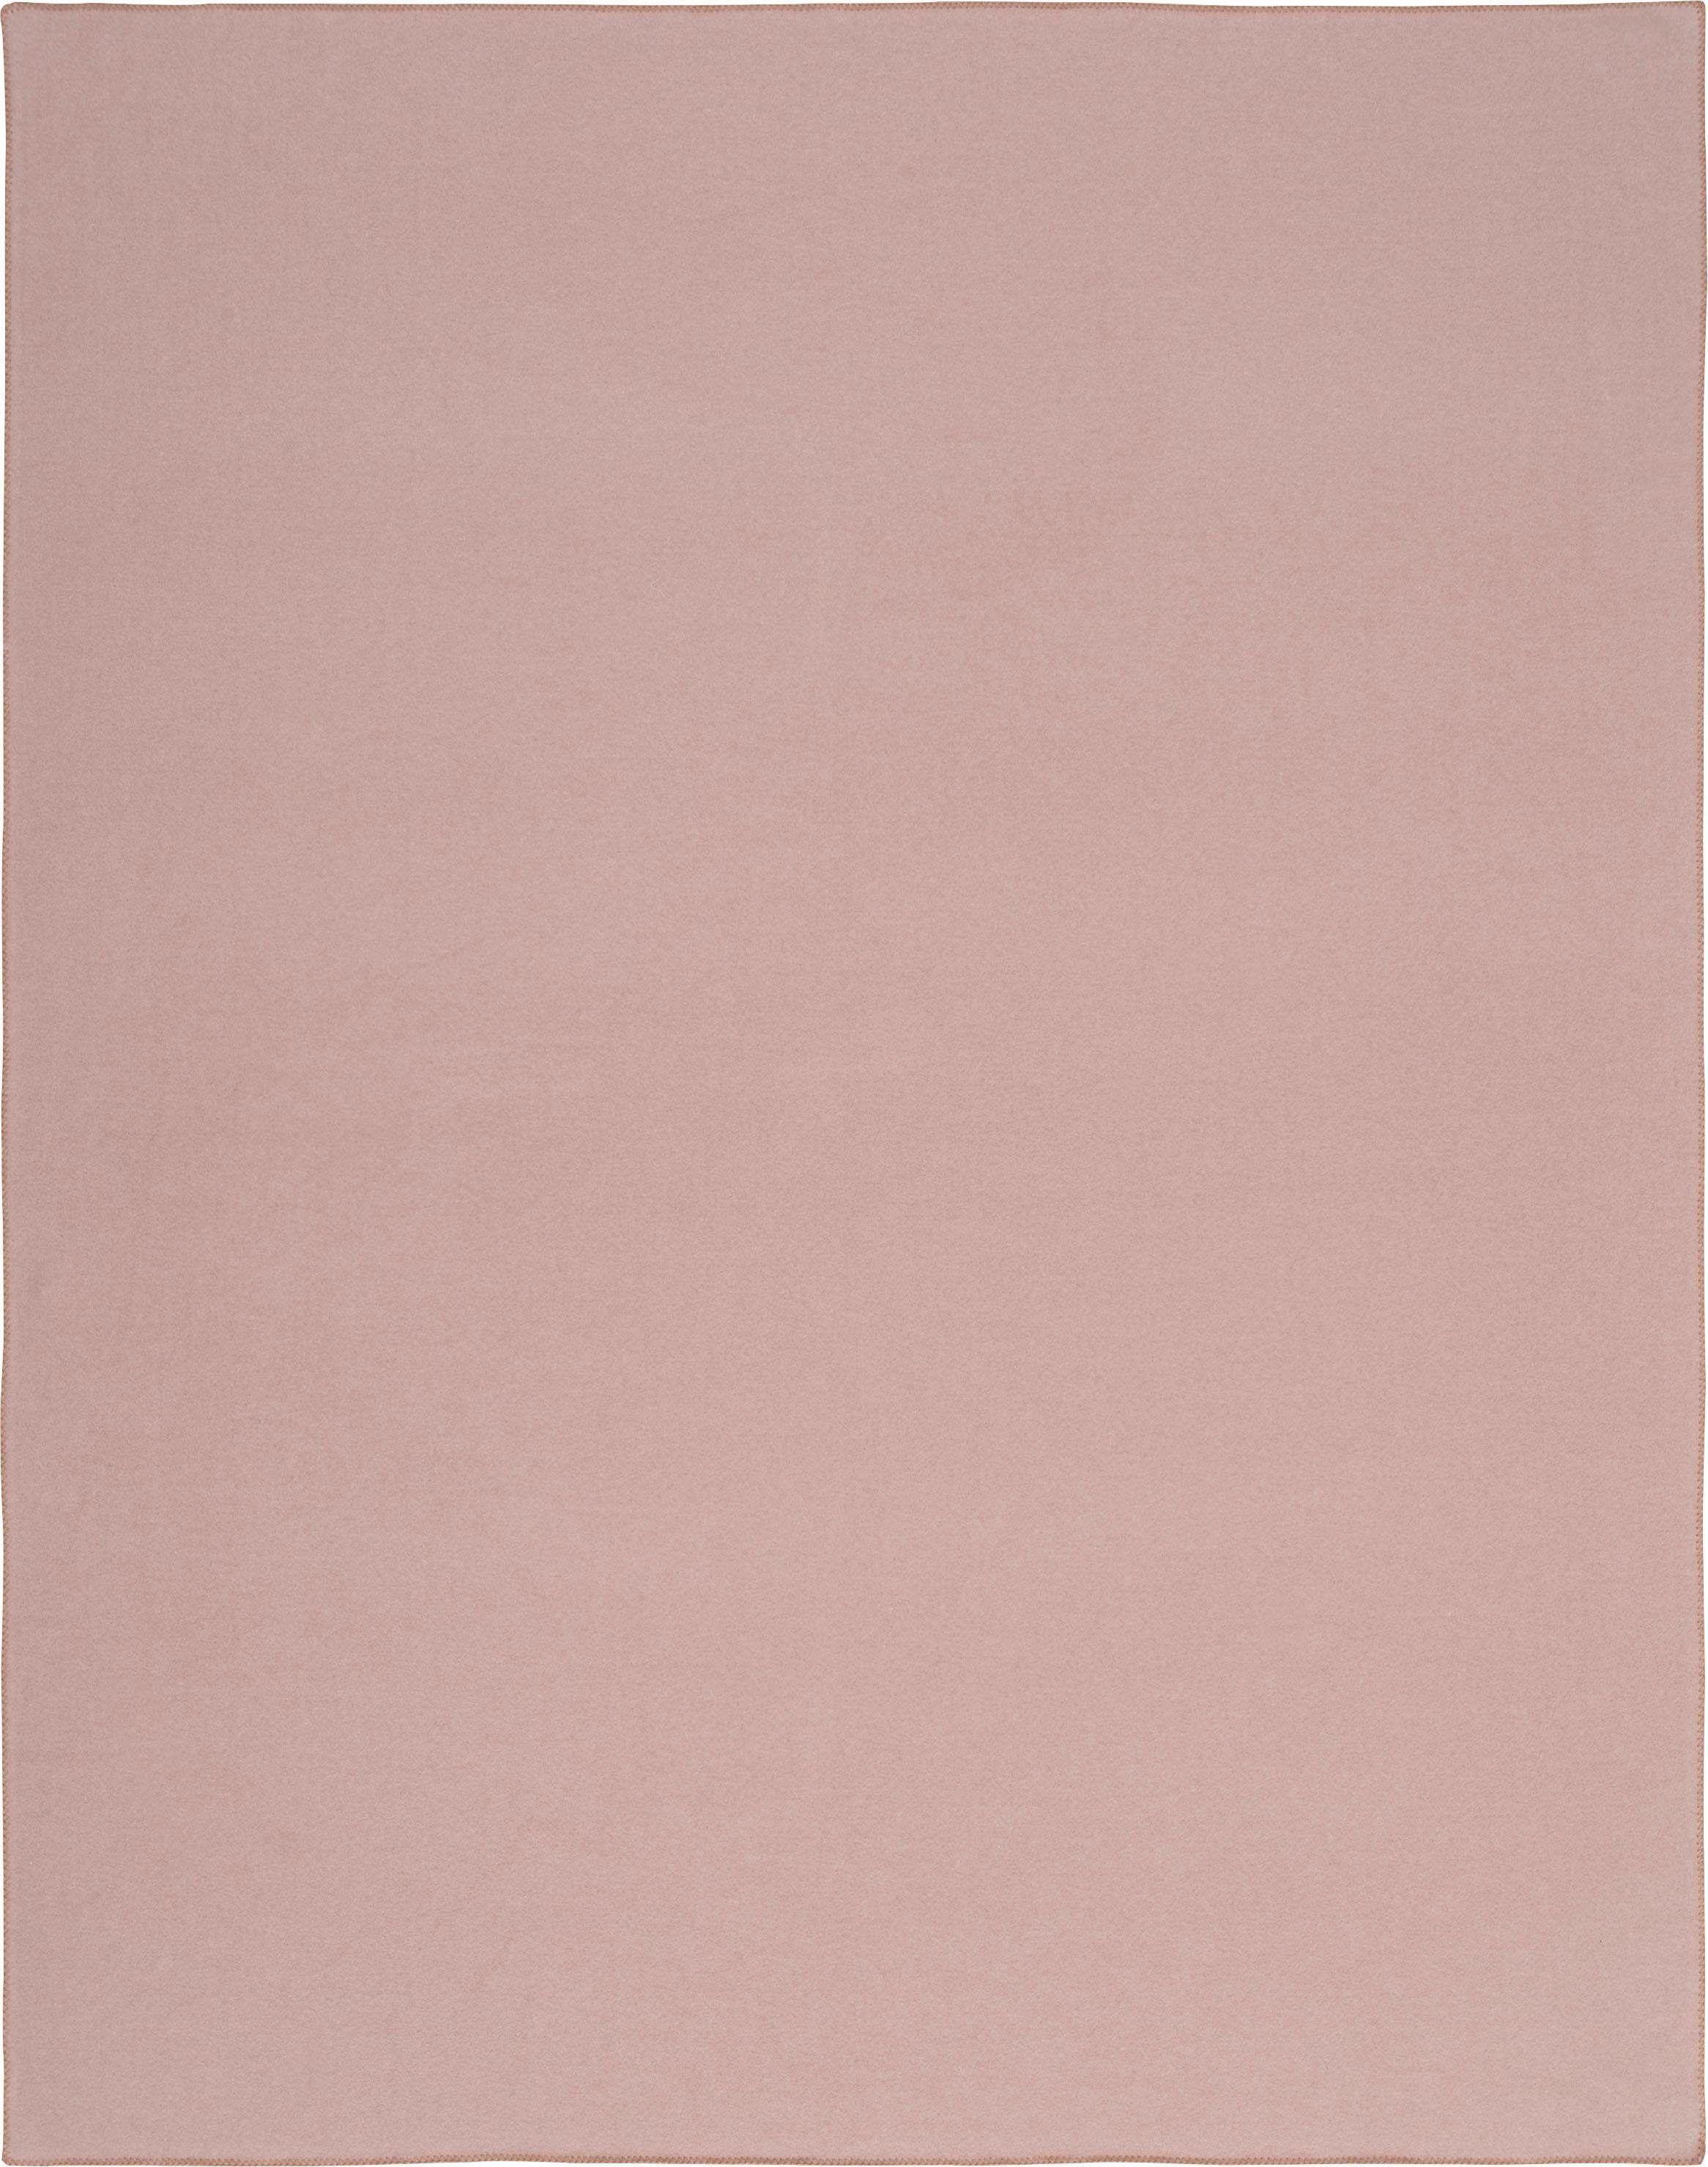 Wohndecke, rosa, Material Fleece »Trevi«, ESTELLA, unifarben